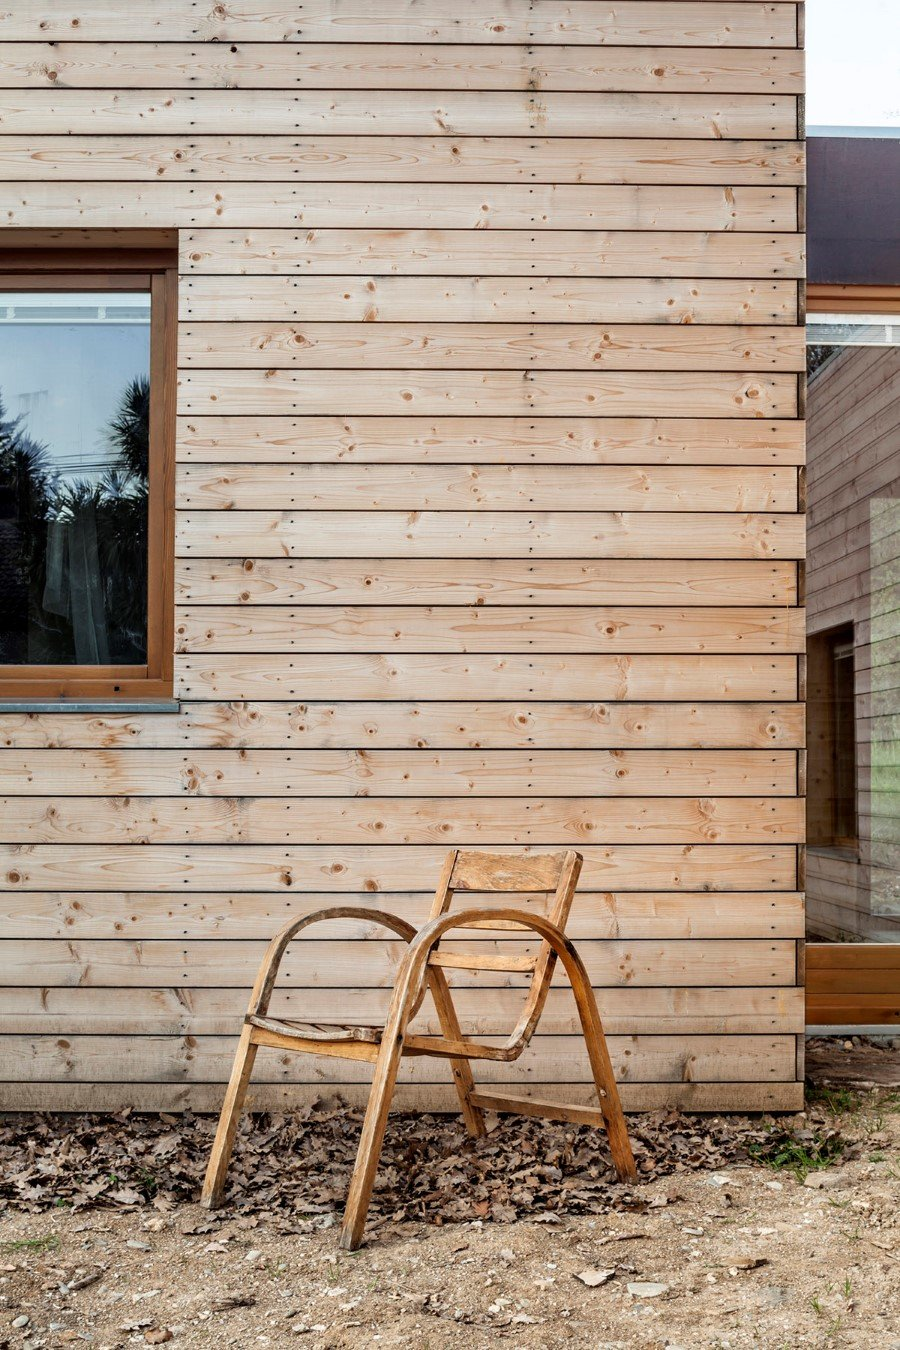 House Energy Efficient - Casa GG by Alventosa Morell Arquitectes (7)